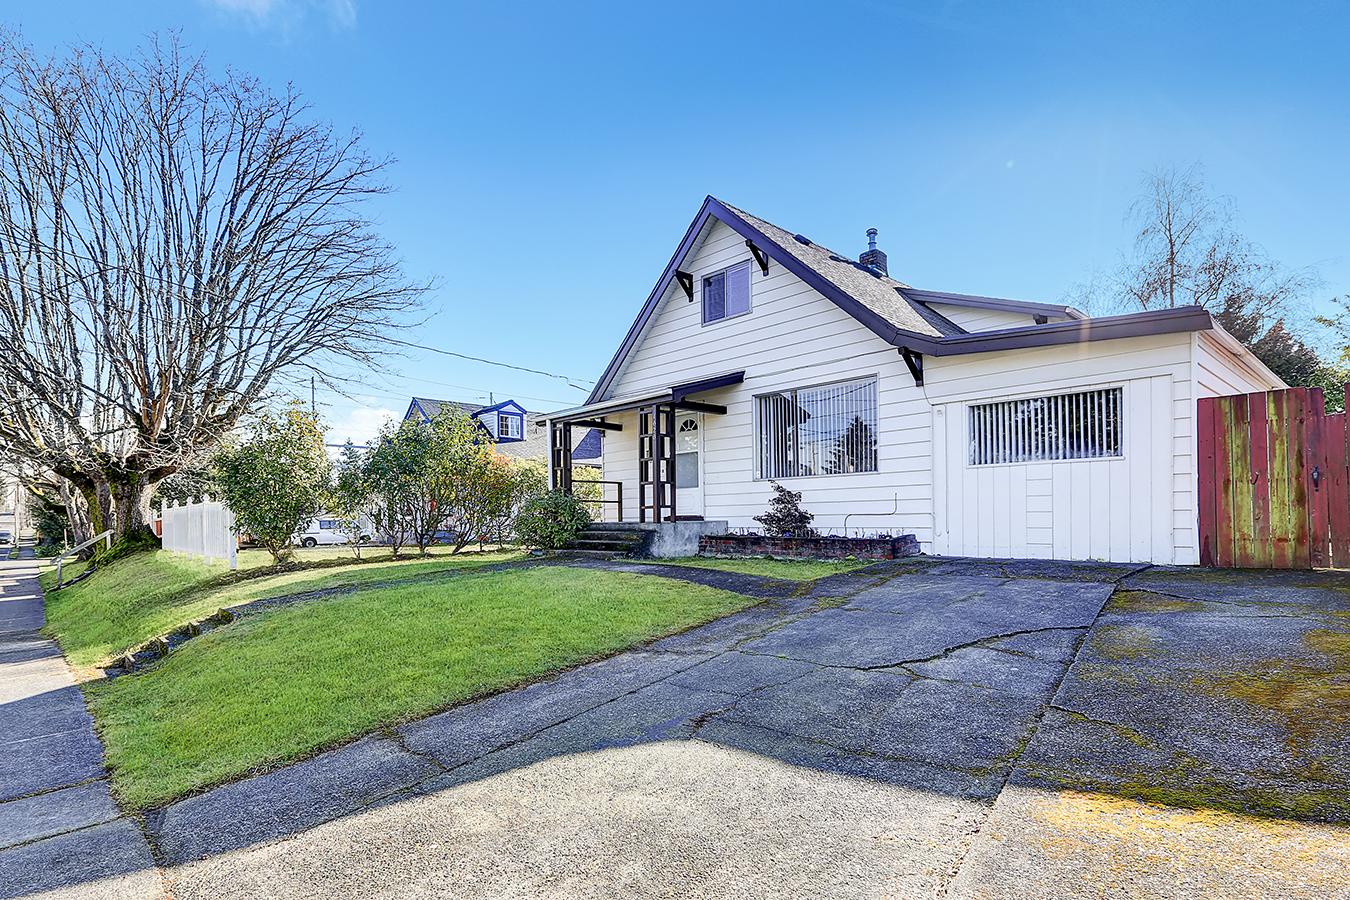 1020 S 64th St, Tacoma, WA - USA (photo 2)